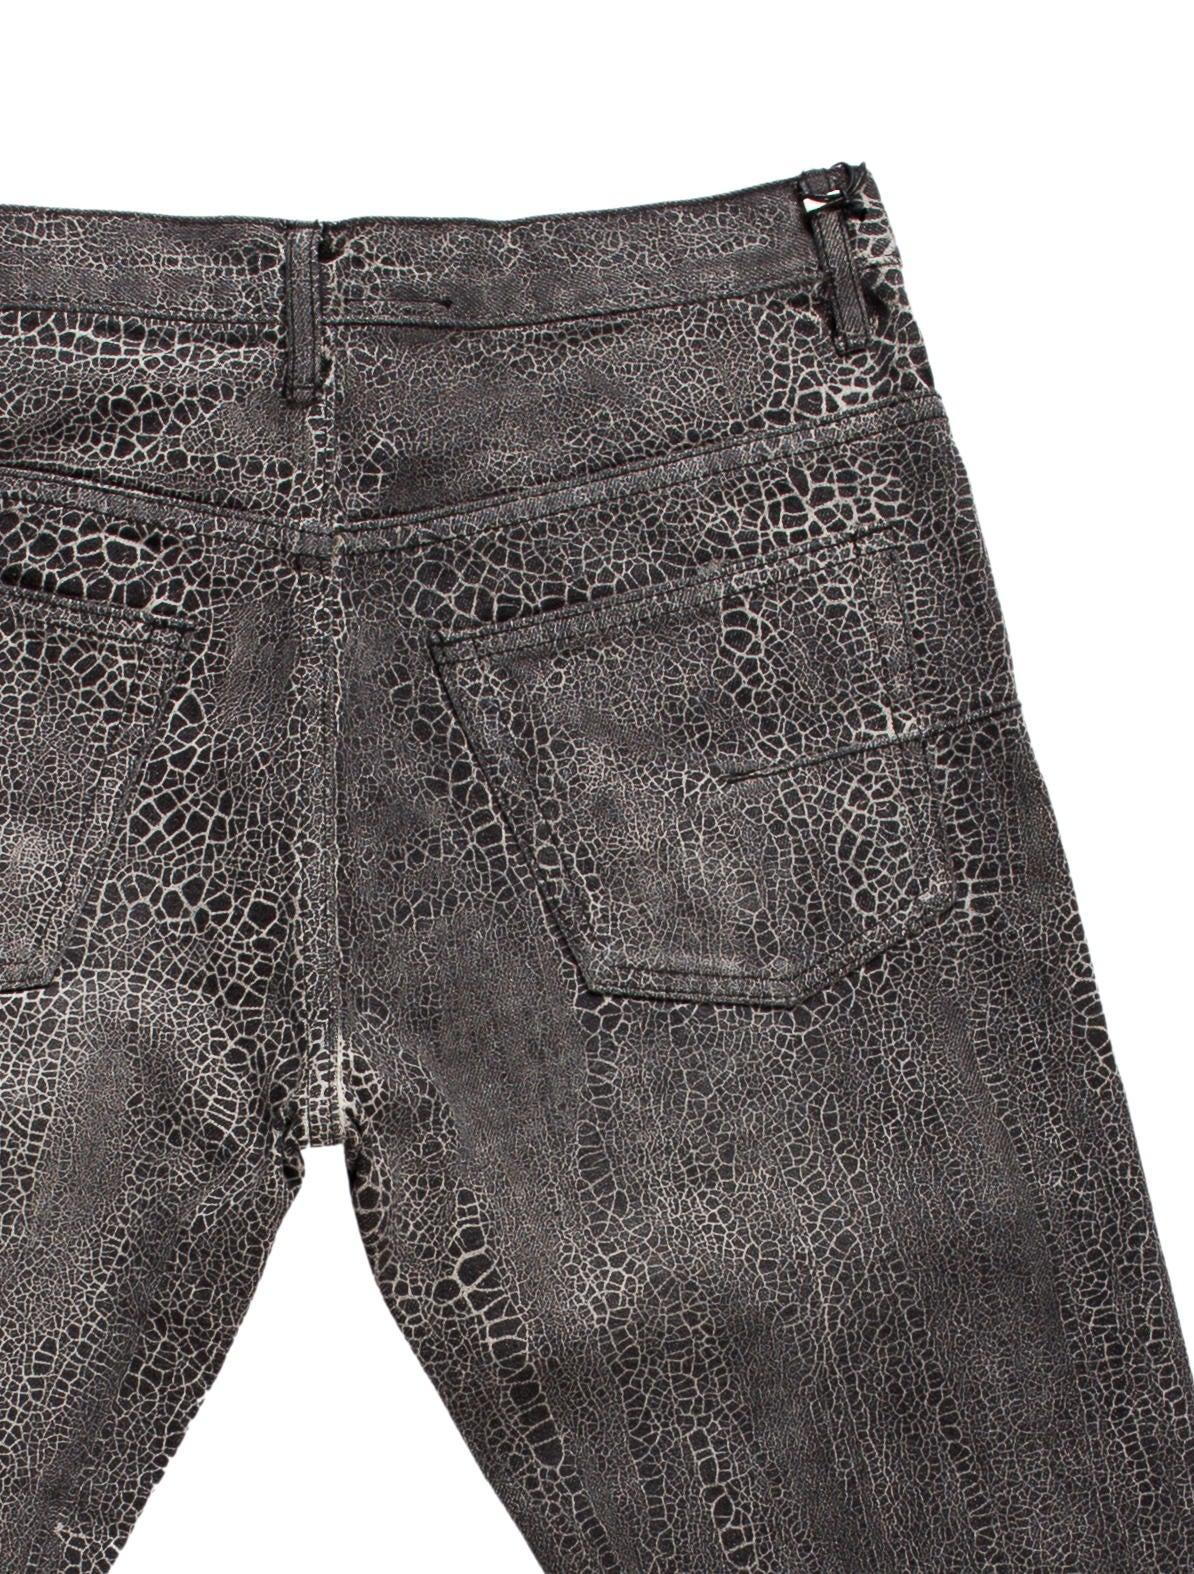 dior homme slim leg jeans clothing hmm21316 the realreal. Black Bedroom Furniture Sets. Home Design Ideas